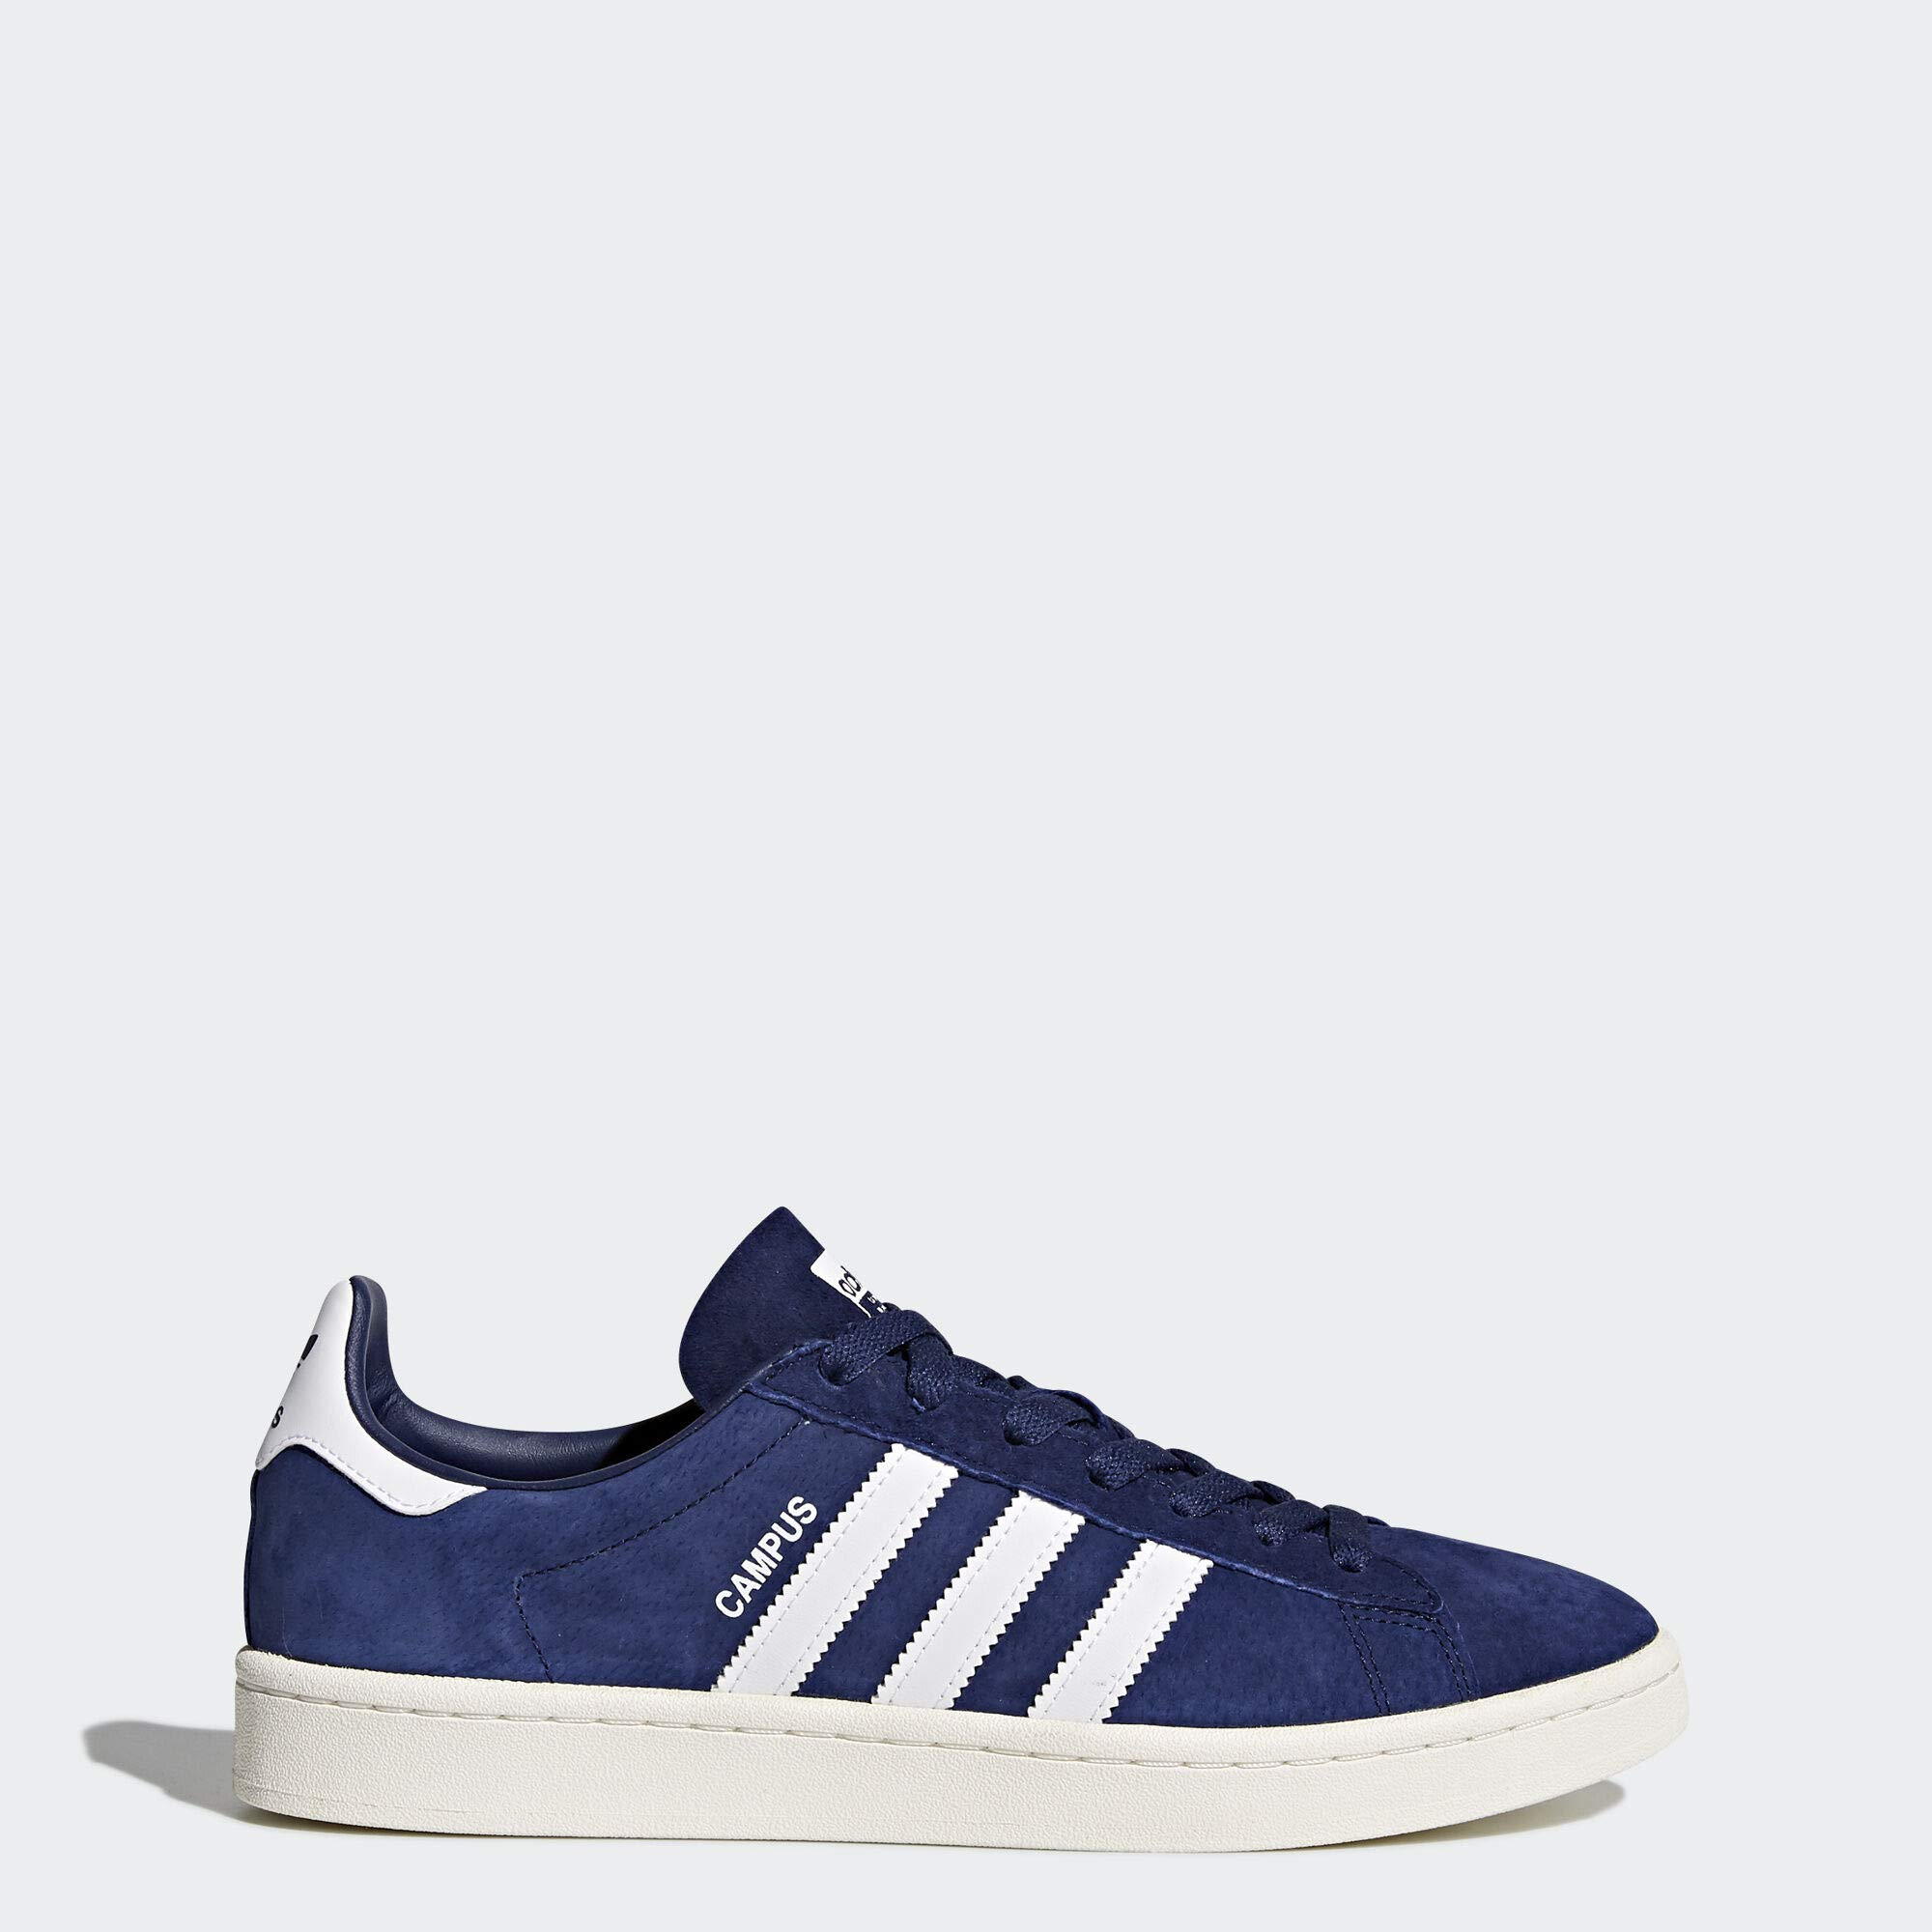 adidas Originals Men's Campus Sneakers, Dark Blue Chalk White, (9 M US)